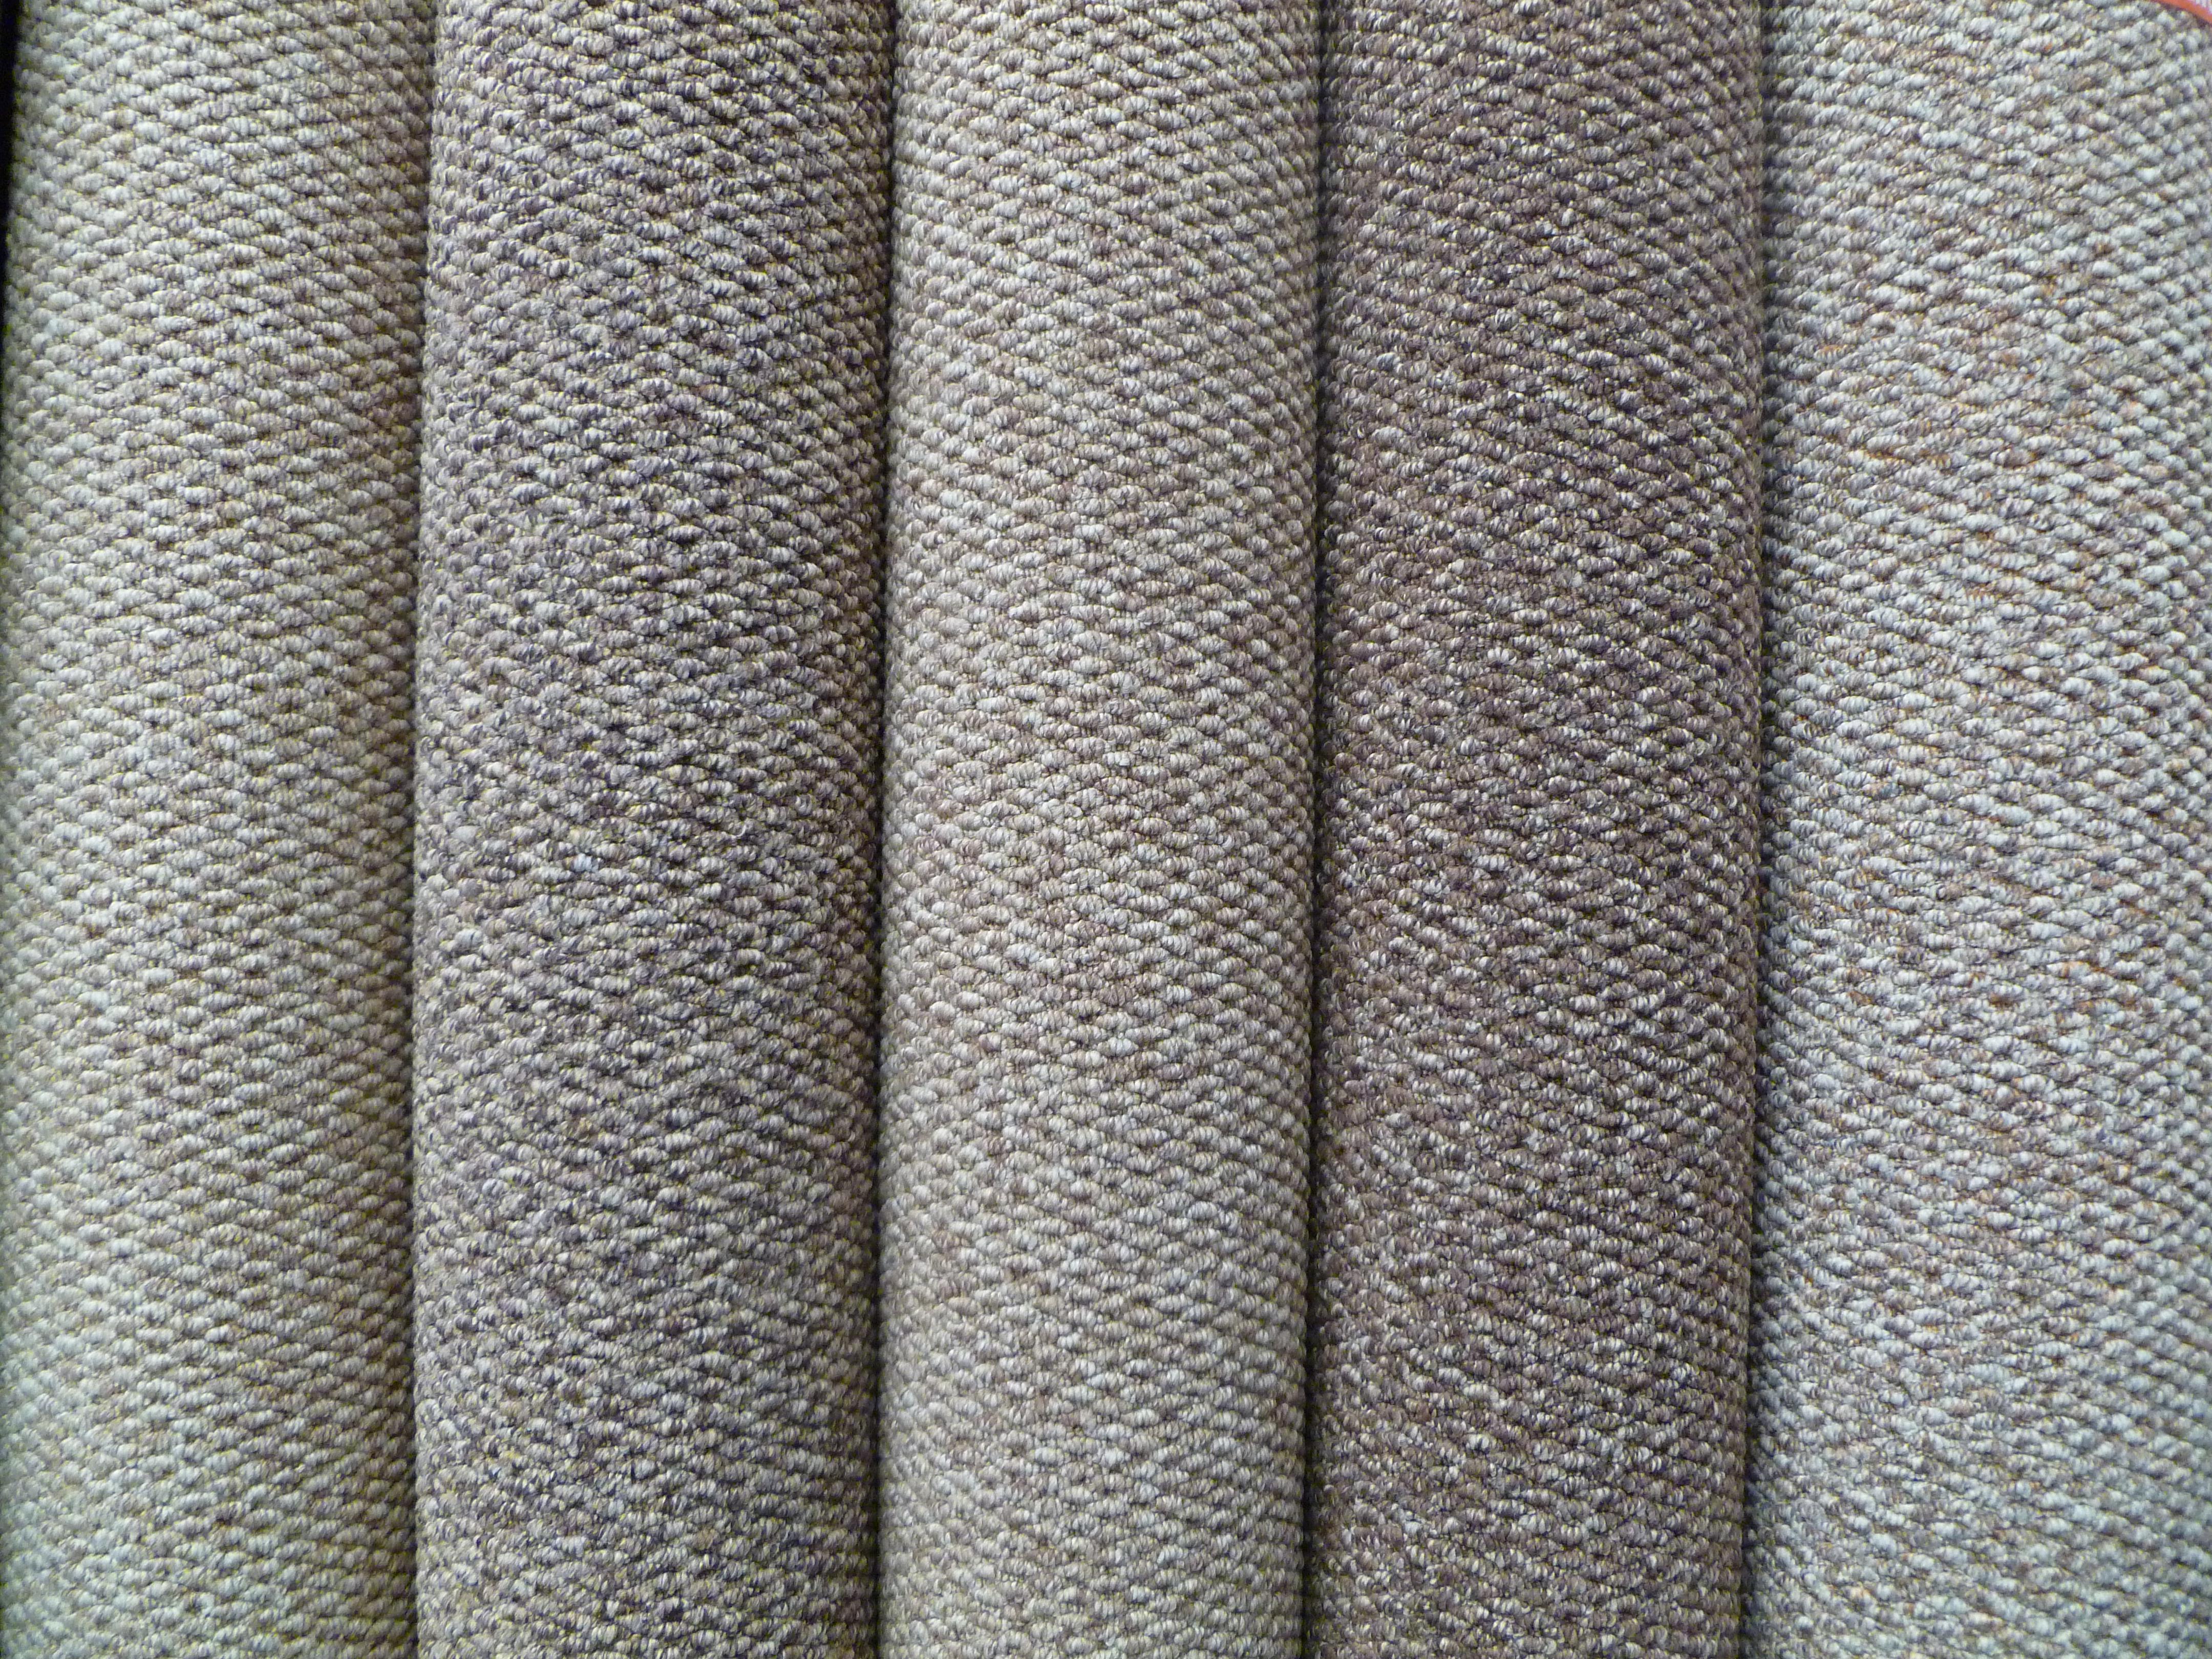 Gallagher S Carpet Care Sacramento Carpet Cleaning